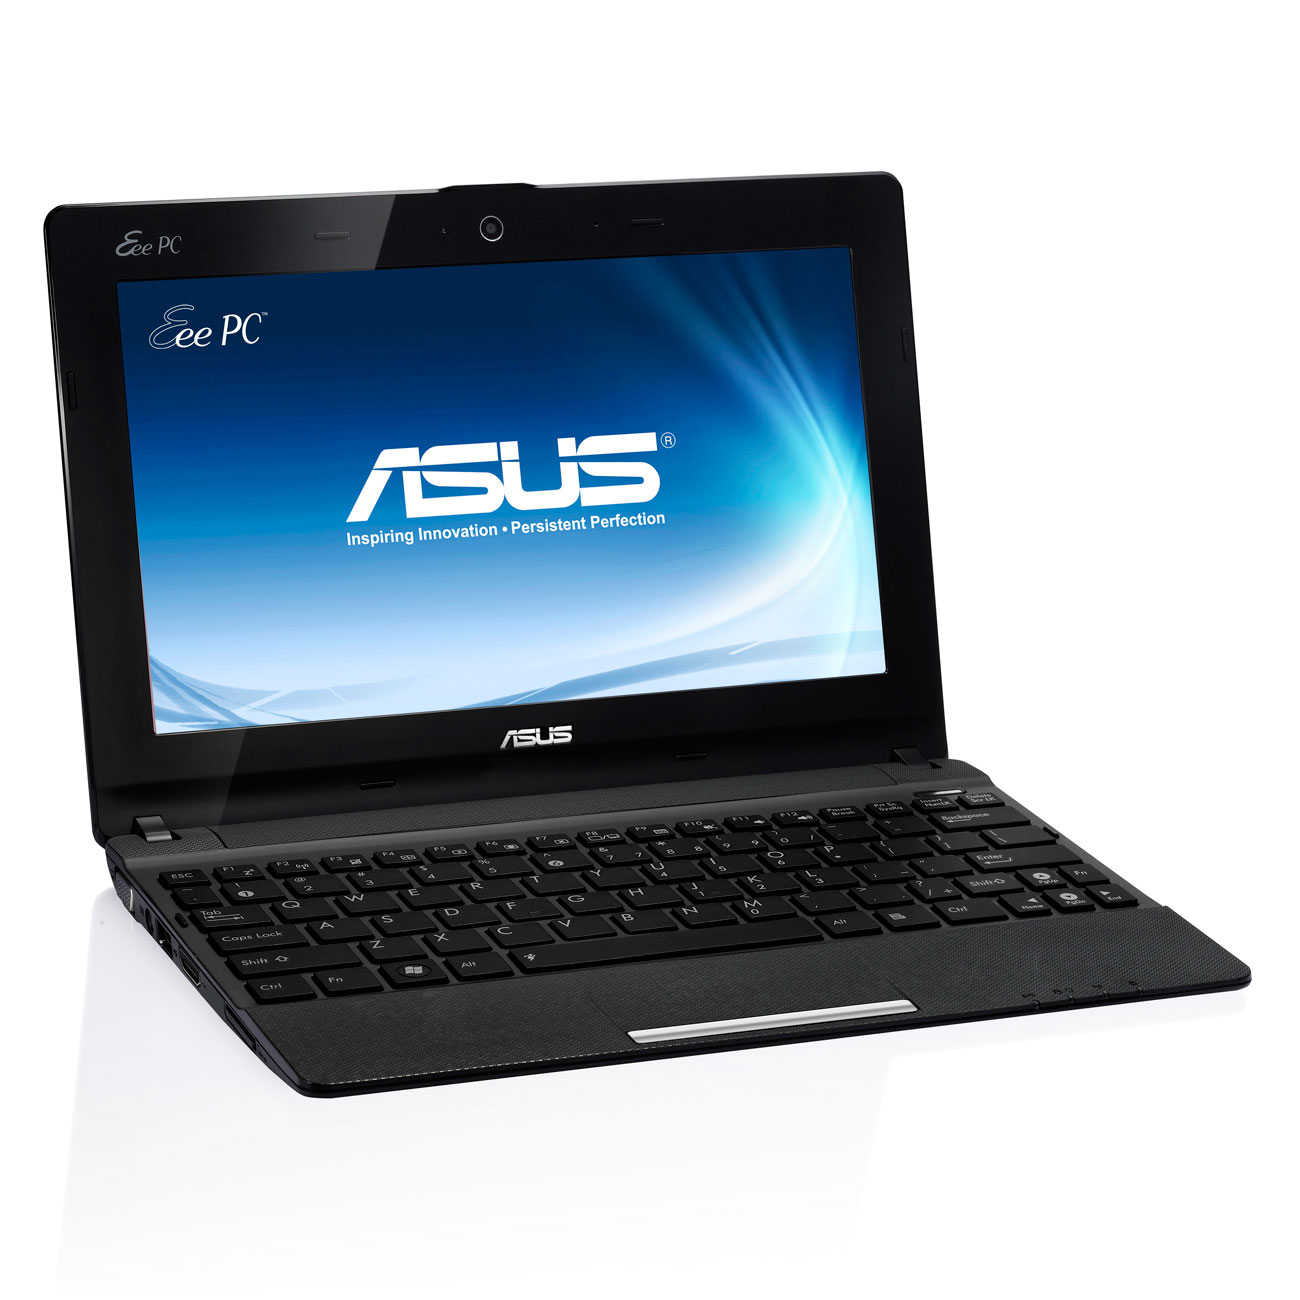 "LDLC.com ASUS Eee PC X101CH-BLK023S Noir Intel Atom N2600 1 Go 320 Go 10.1"" LED Wi-Fi N Webcam Windows 7 Starter"